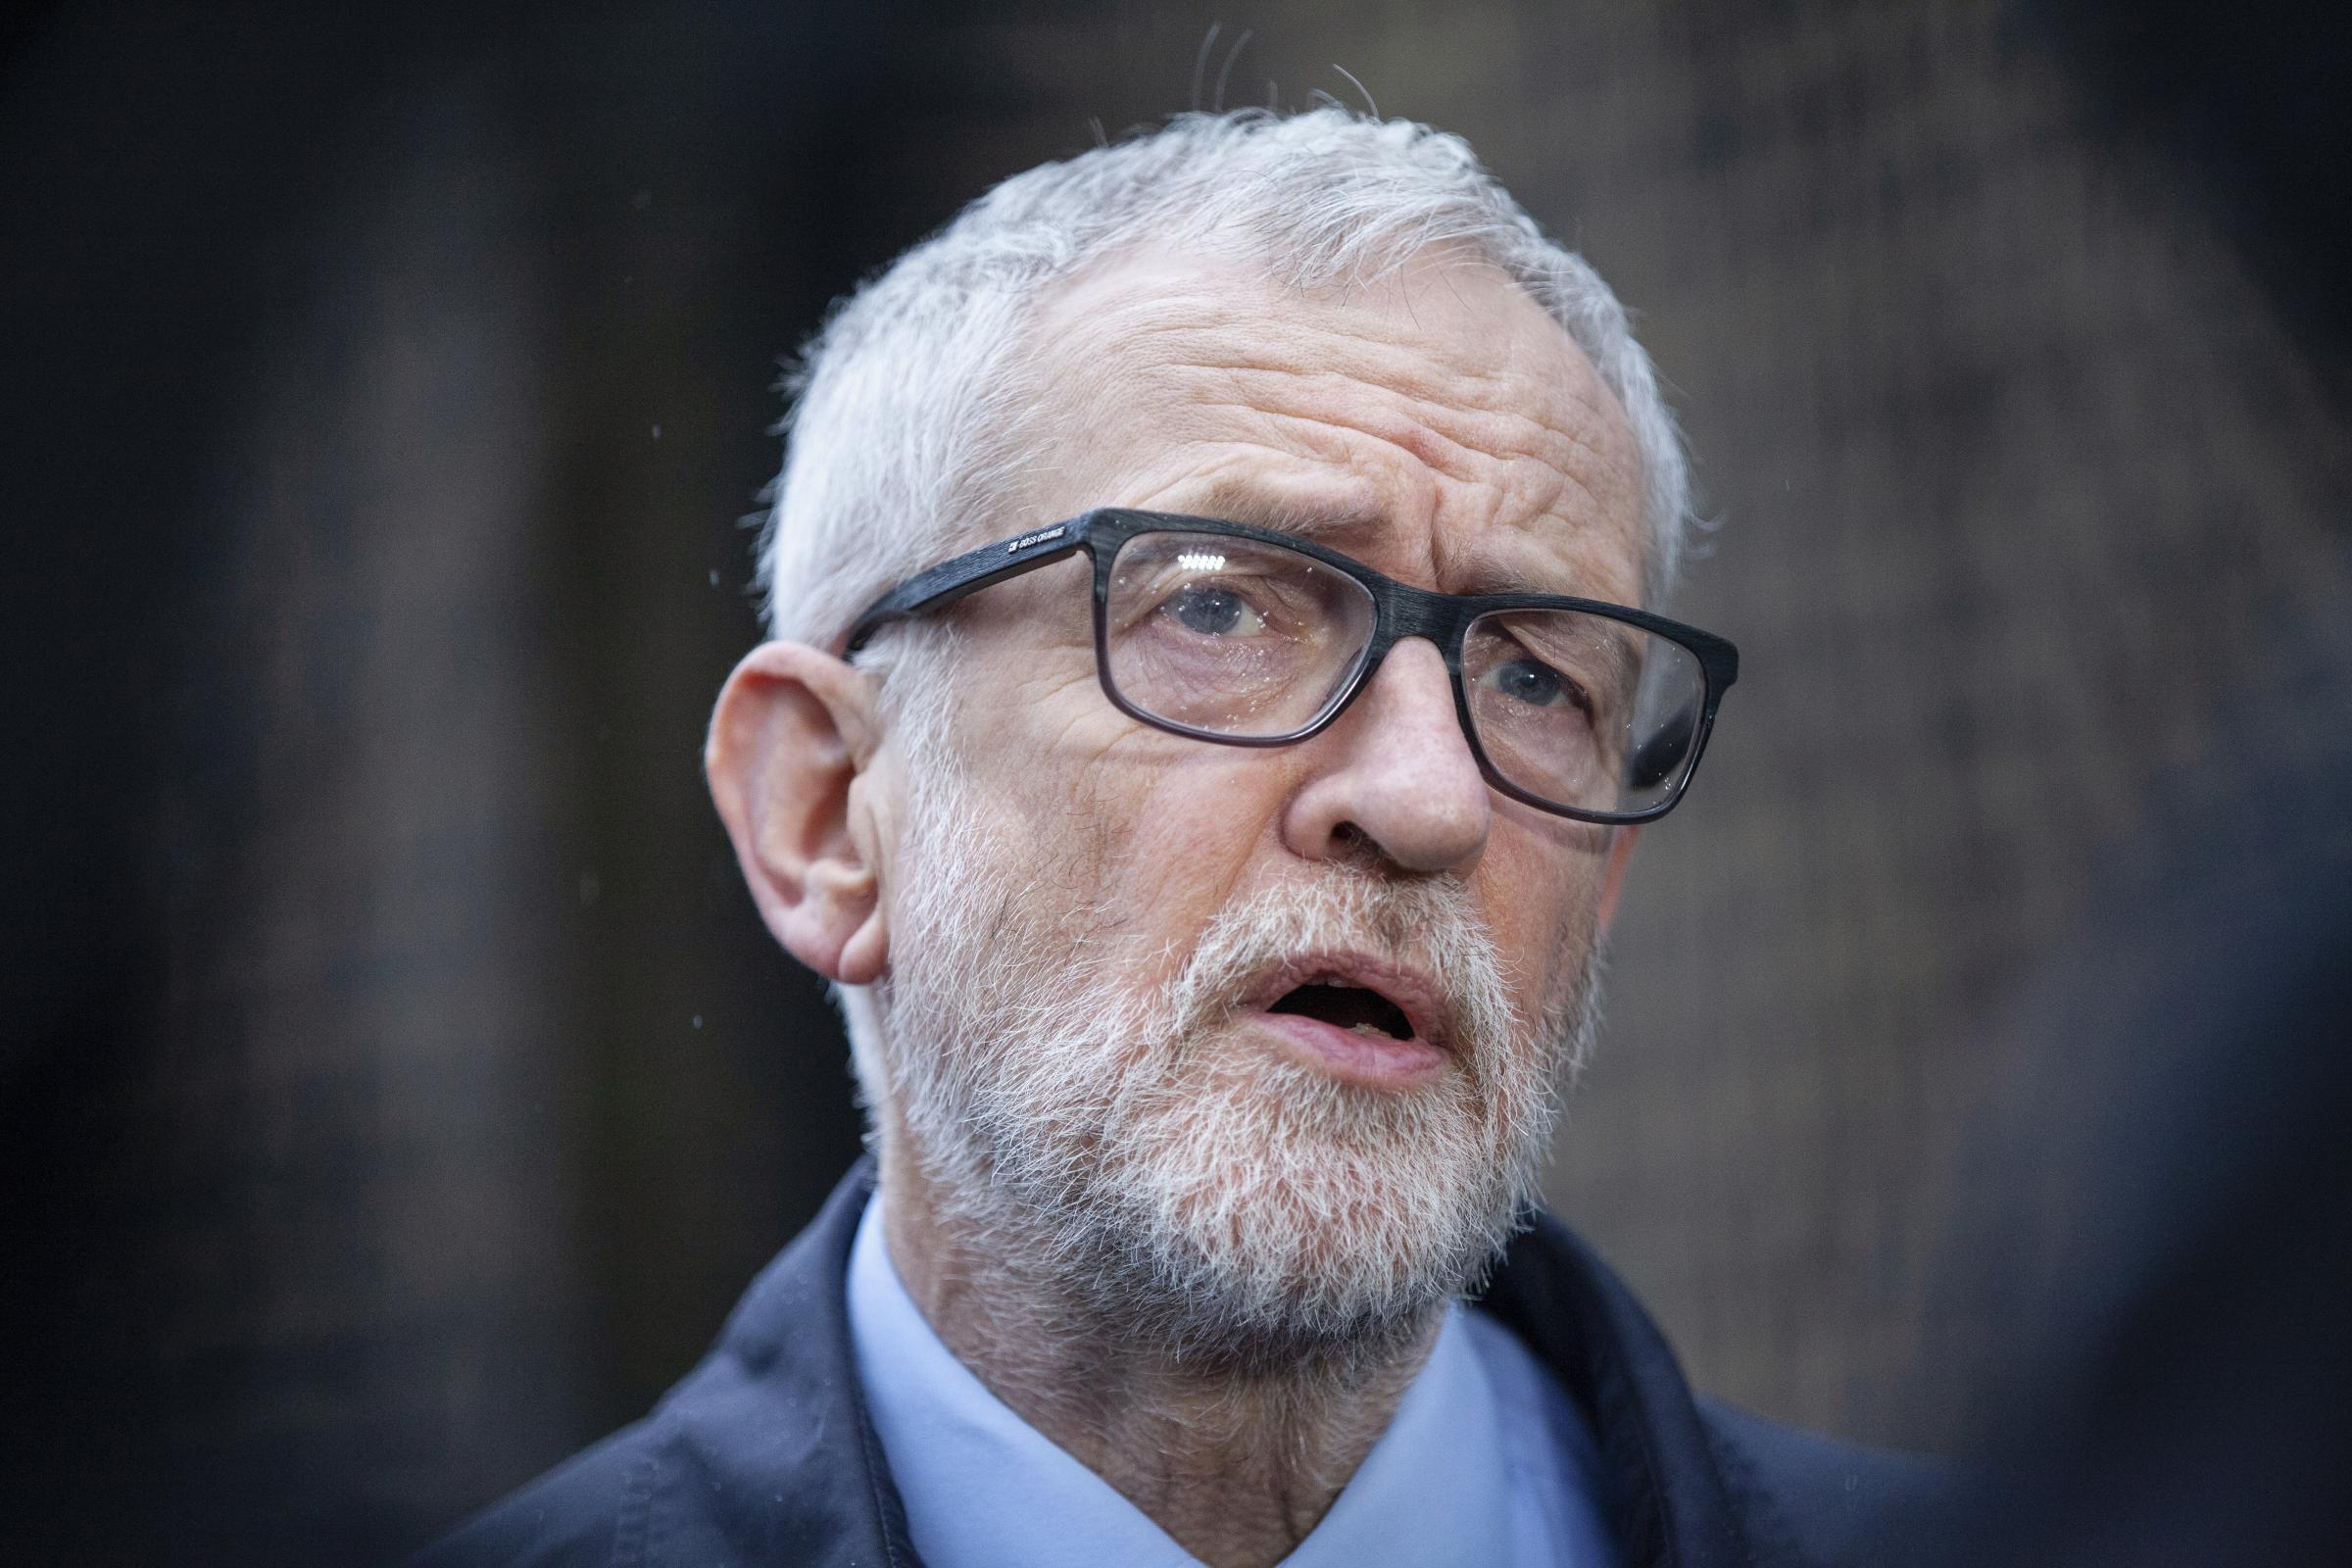 Jeremy Corbyn to hold 'alternative Cop26' conference in Scotland